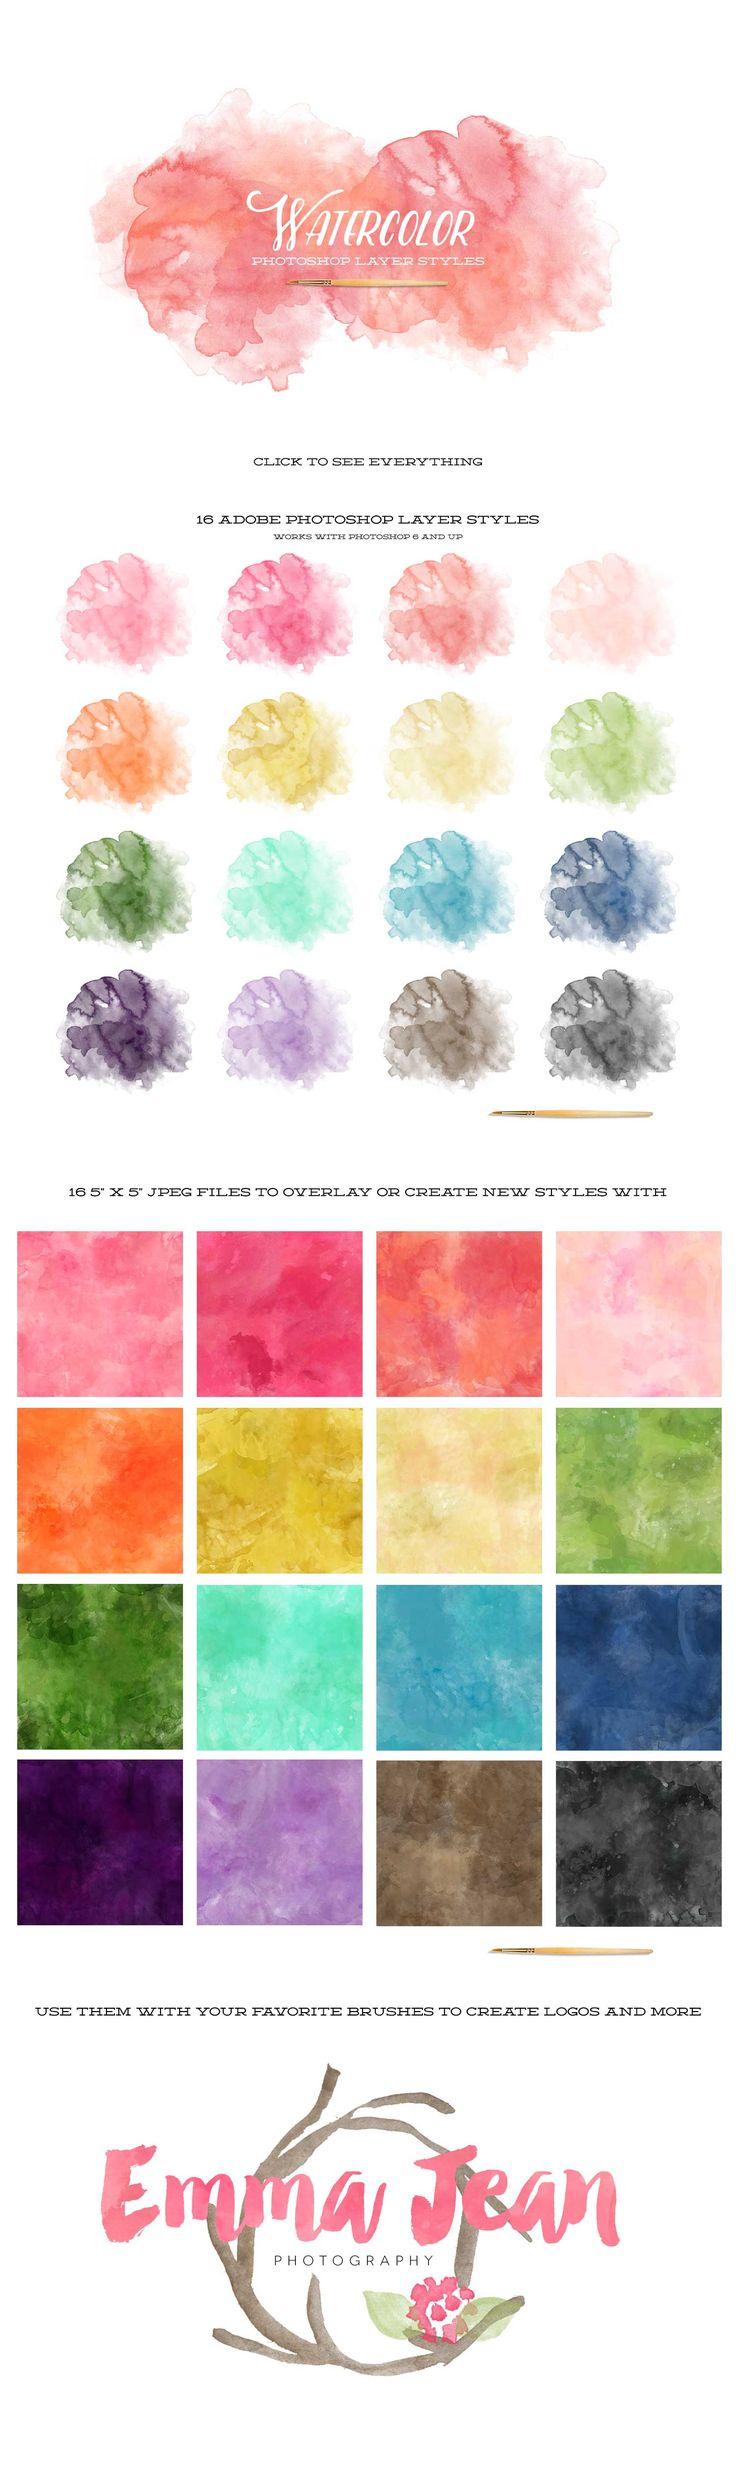 Watercolor art history brush cs6 - Watercolor Photoshop Layer Styles